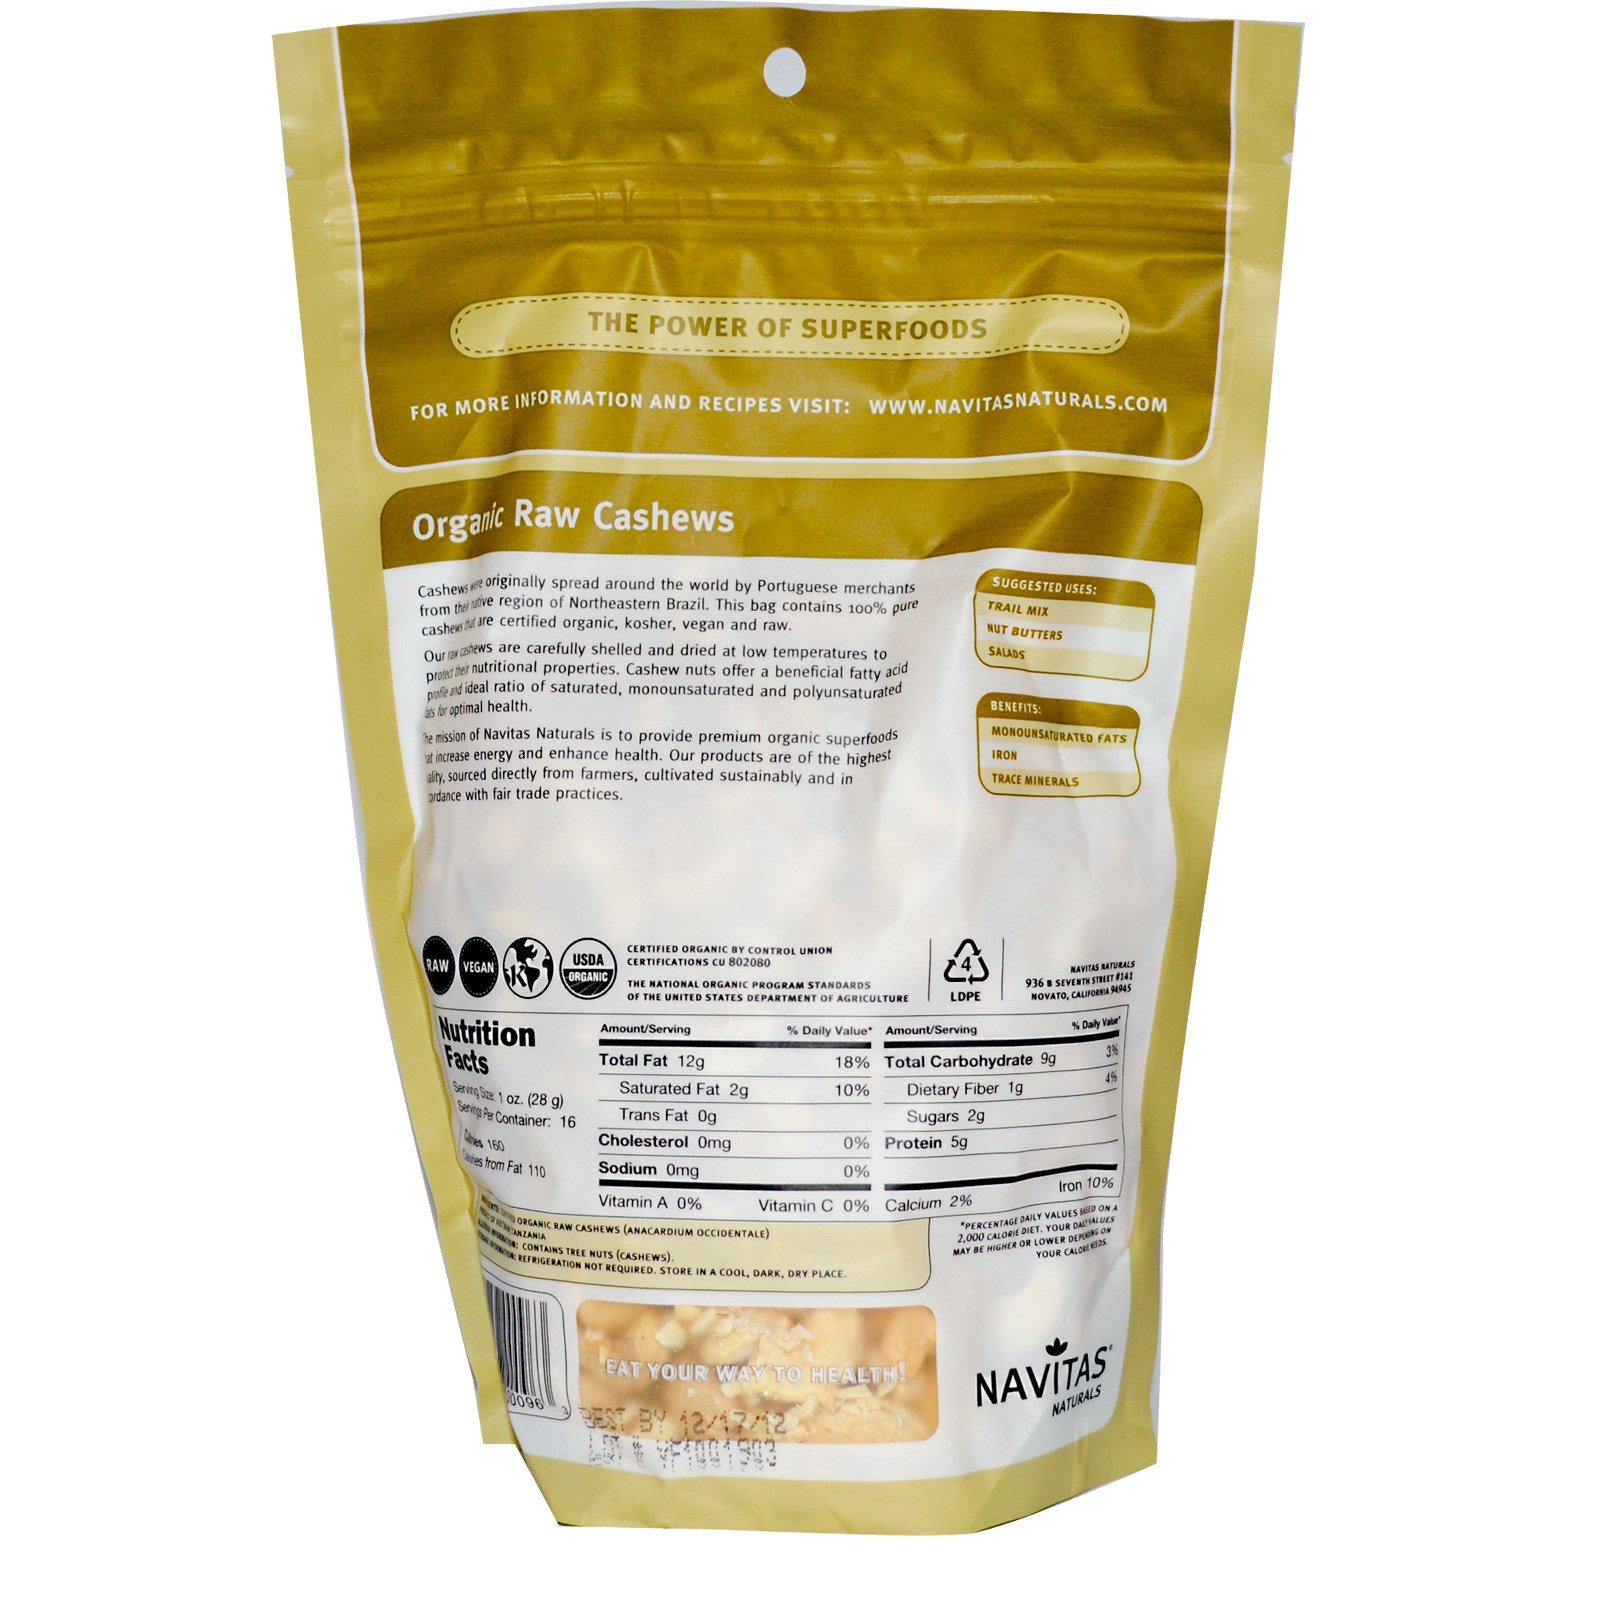 Navitas Naturals Certified Organic Raw Cashew Nuts  Oz